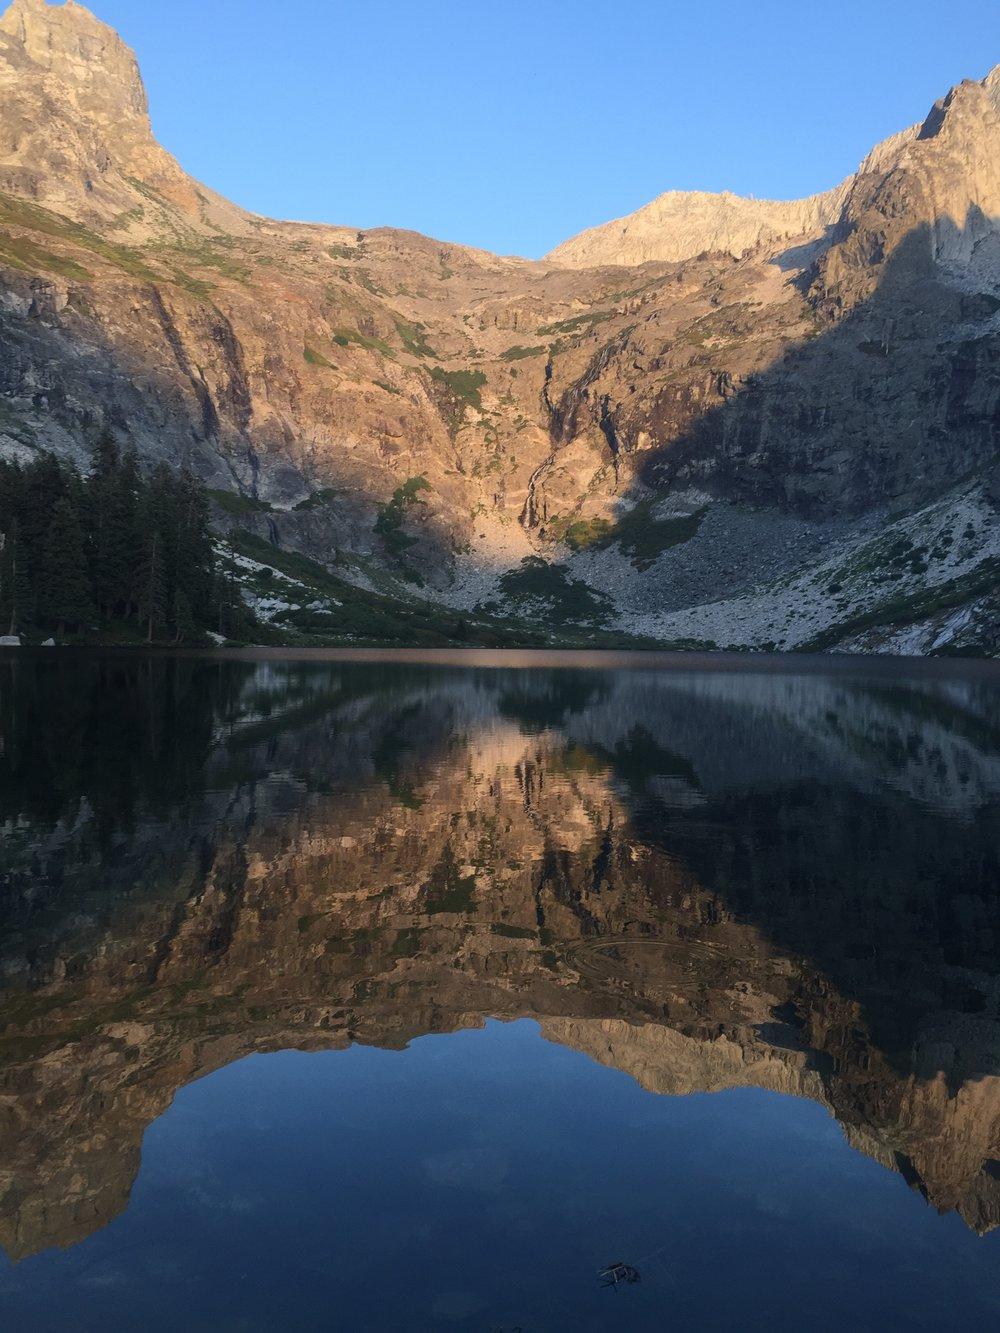 Evening light and reflection, Lake Hamilton